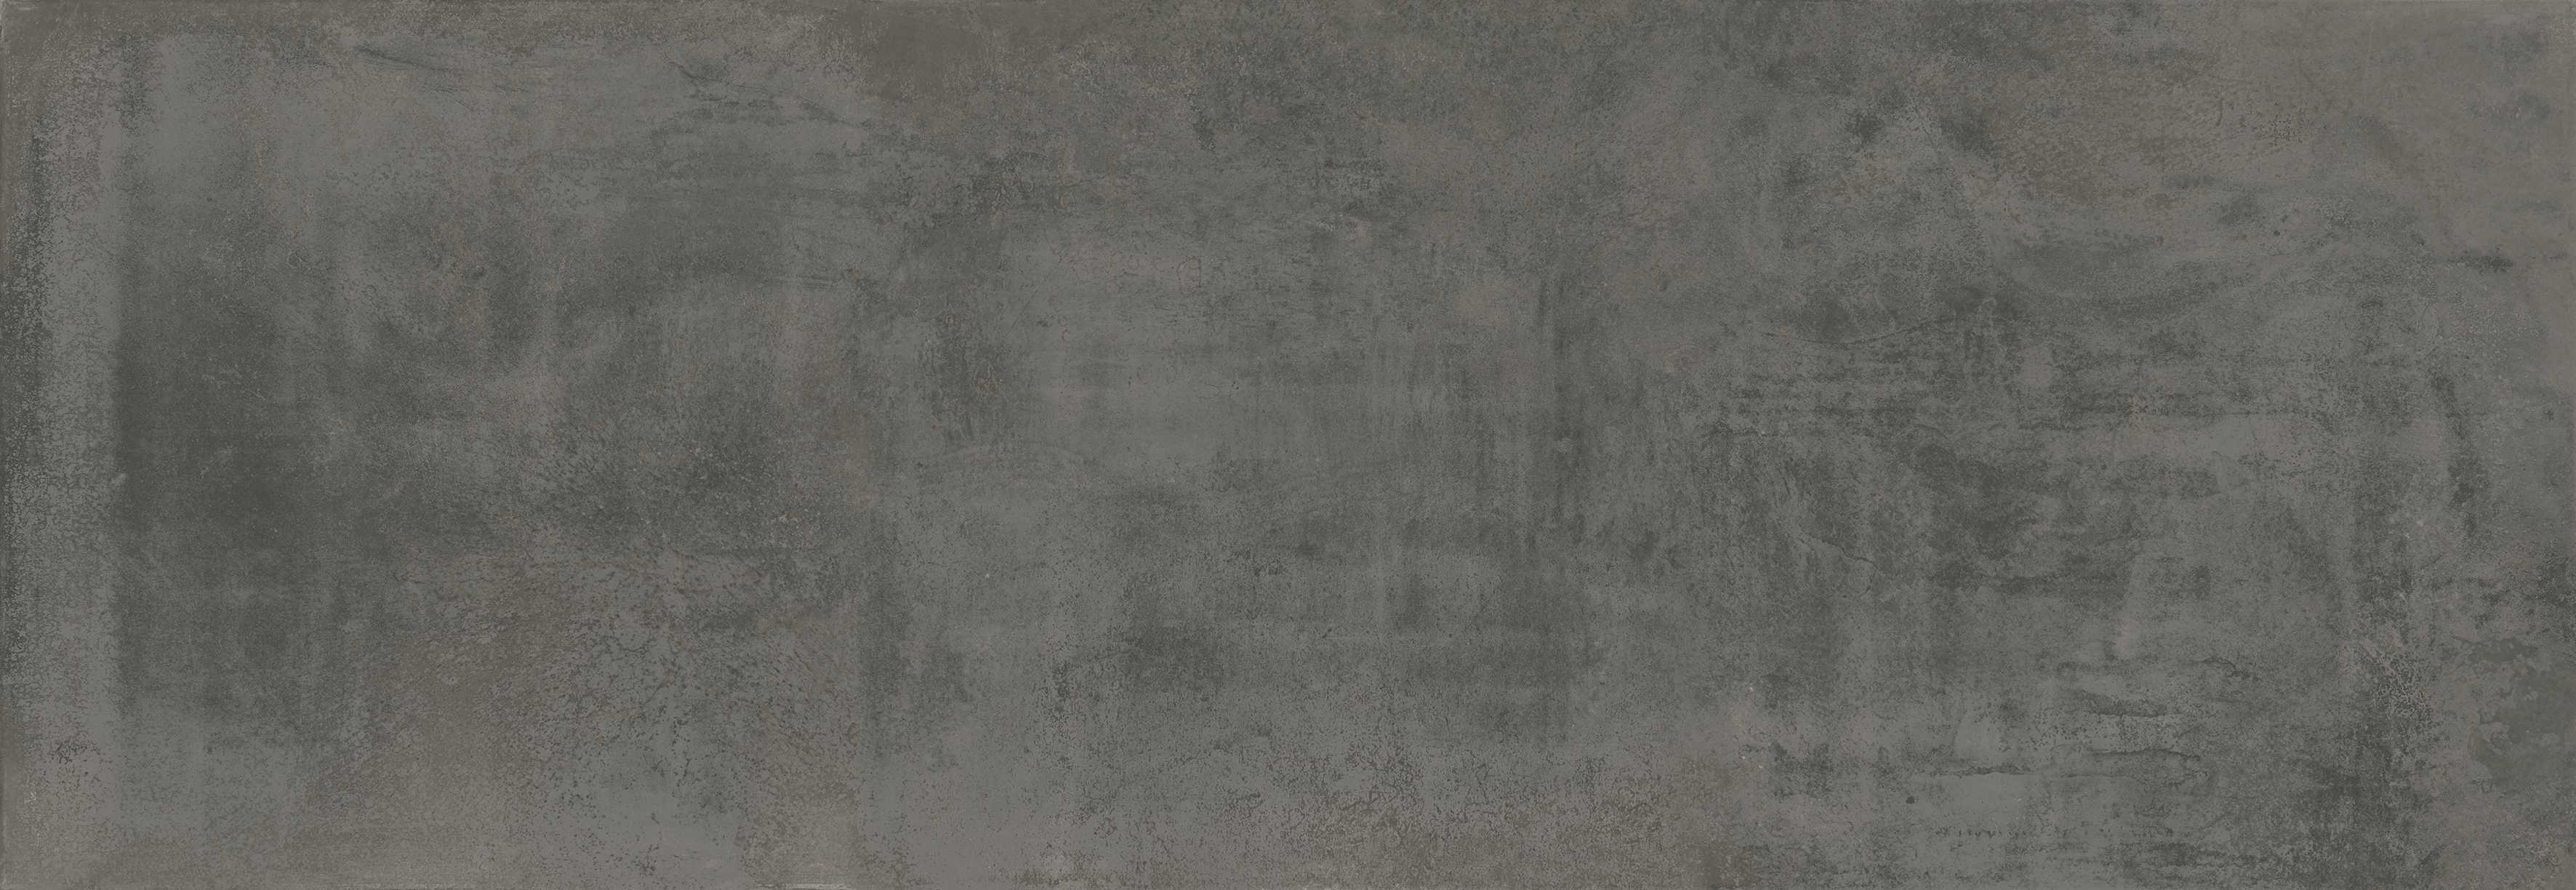 78lv91m lava iron 100×300 1 rgb